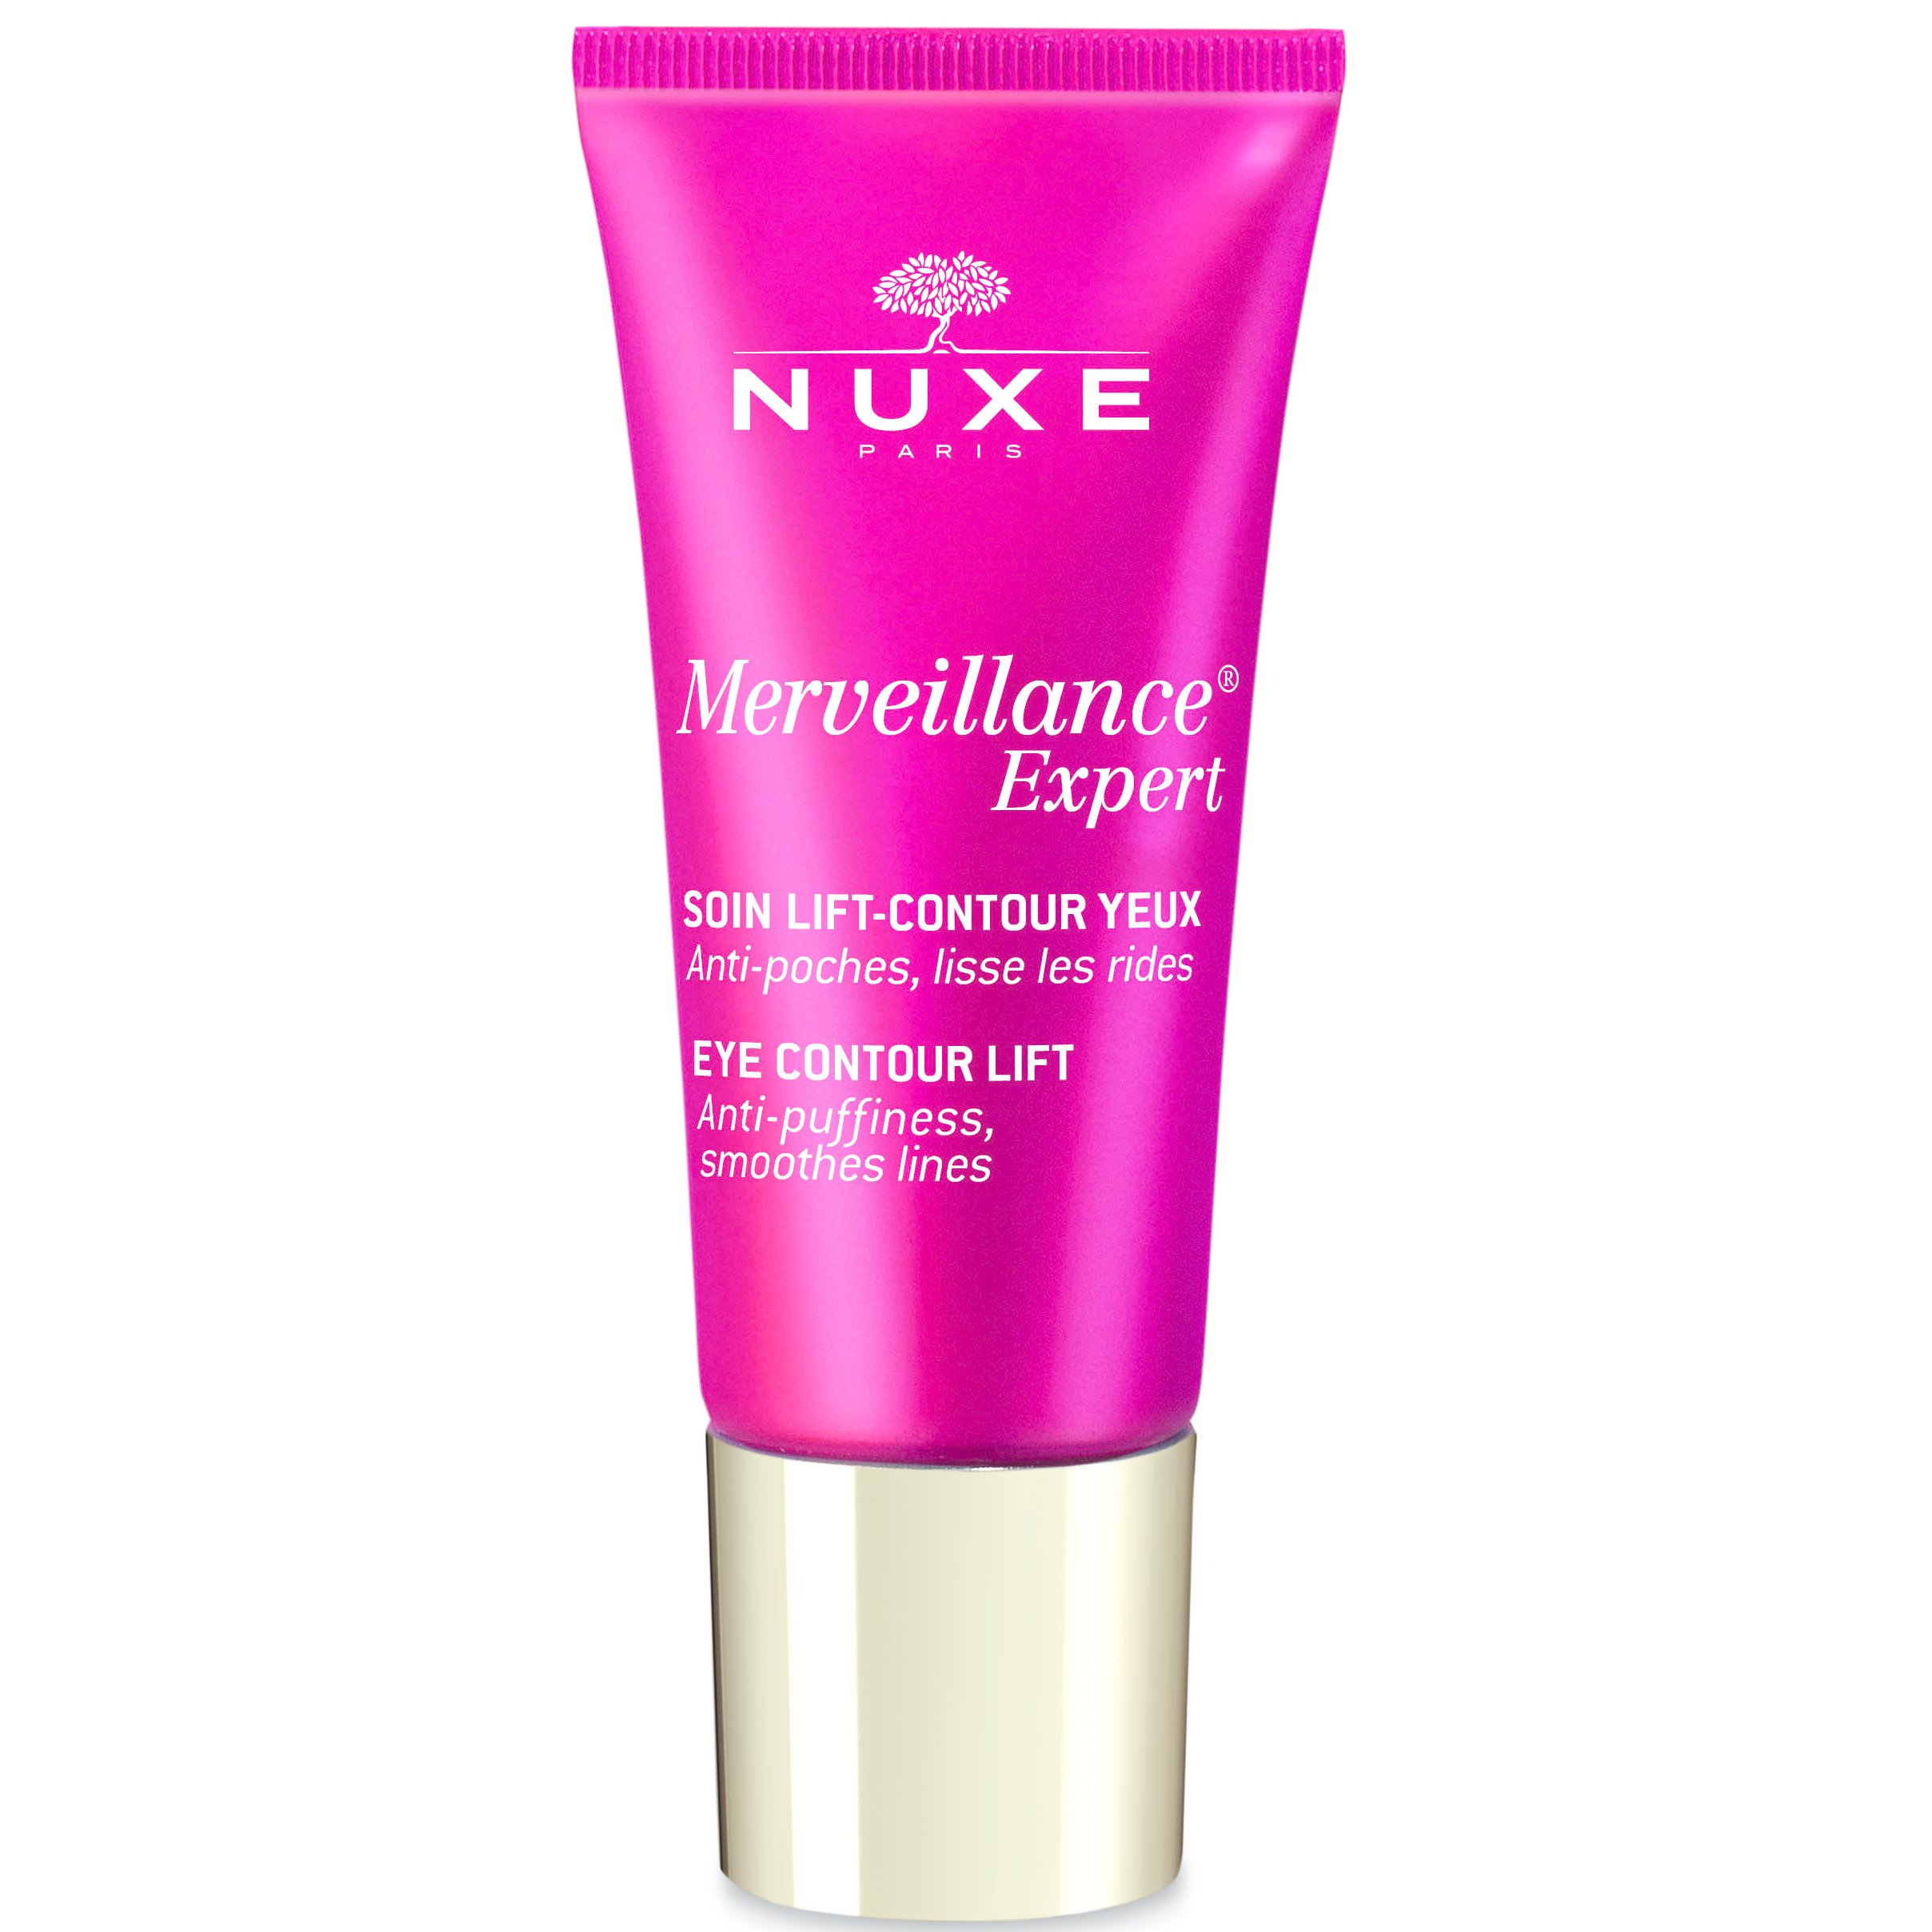 NUXE Merveillance Expert Soin Lift-Contour Yeux Κρέμα Ματιών, Λειαίνει & Δρα Ενάντια στις Σακούλες & τους Μαύρους Κύκλους 15ml